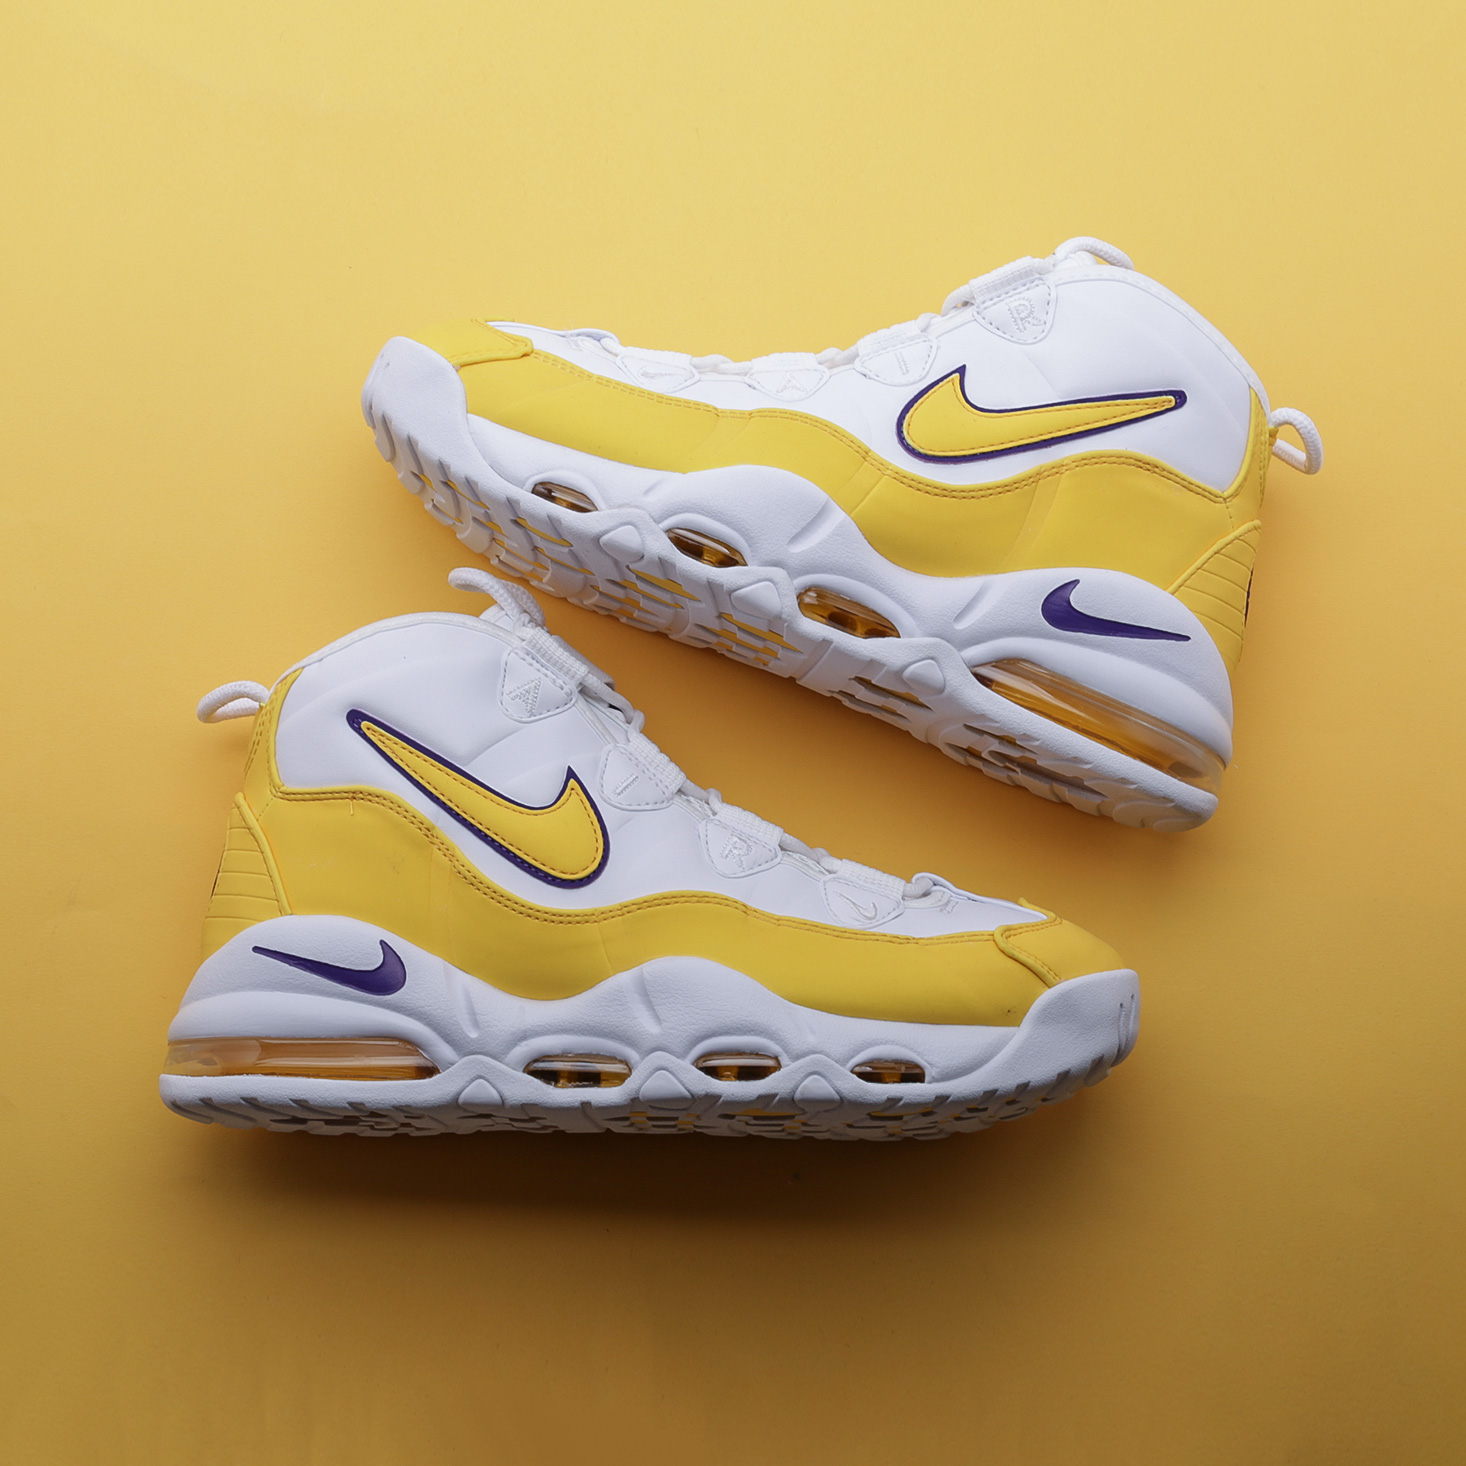 Кроссовки Nike Air Max Uptempo '95